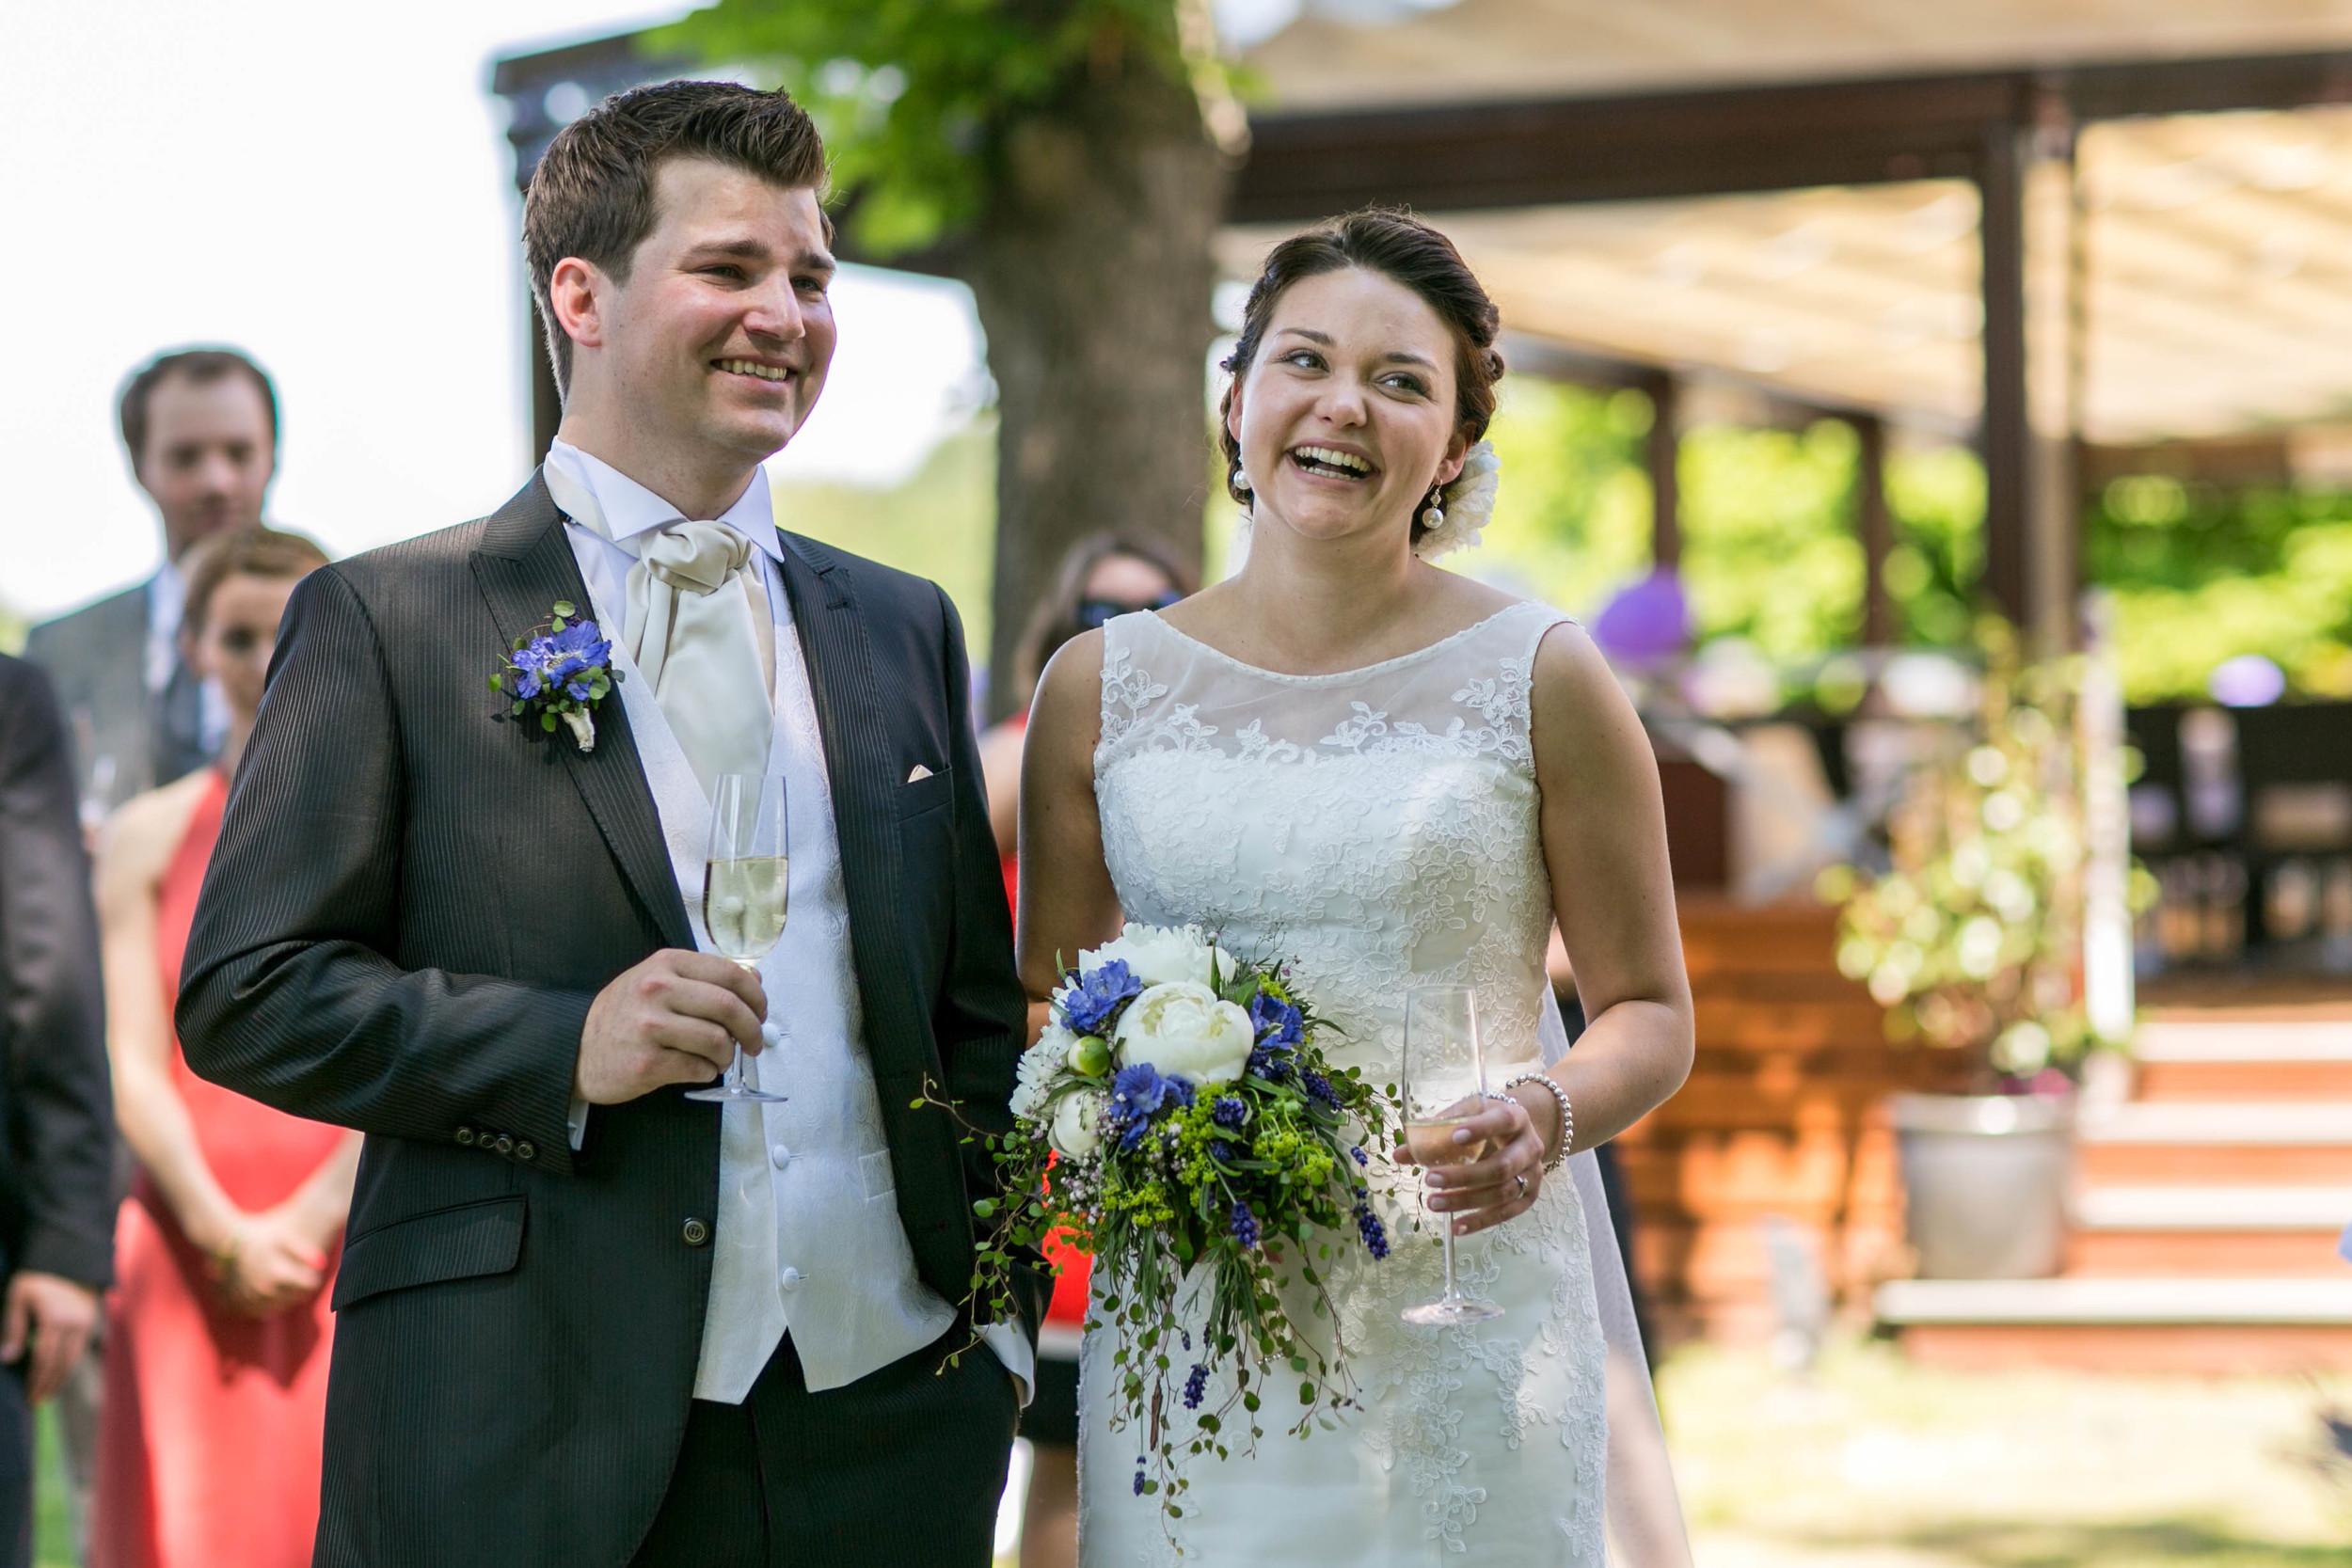 Hochzeitsfotografie Berlin_Fran Burrows Fotografie-103.jpg